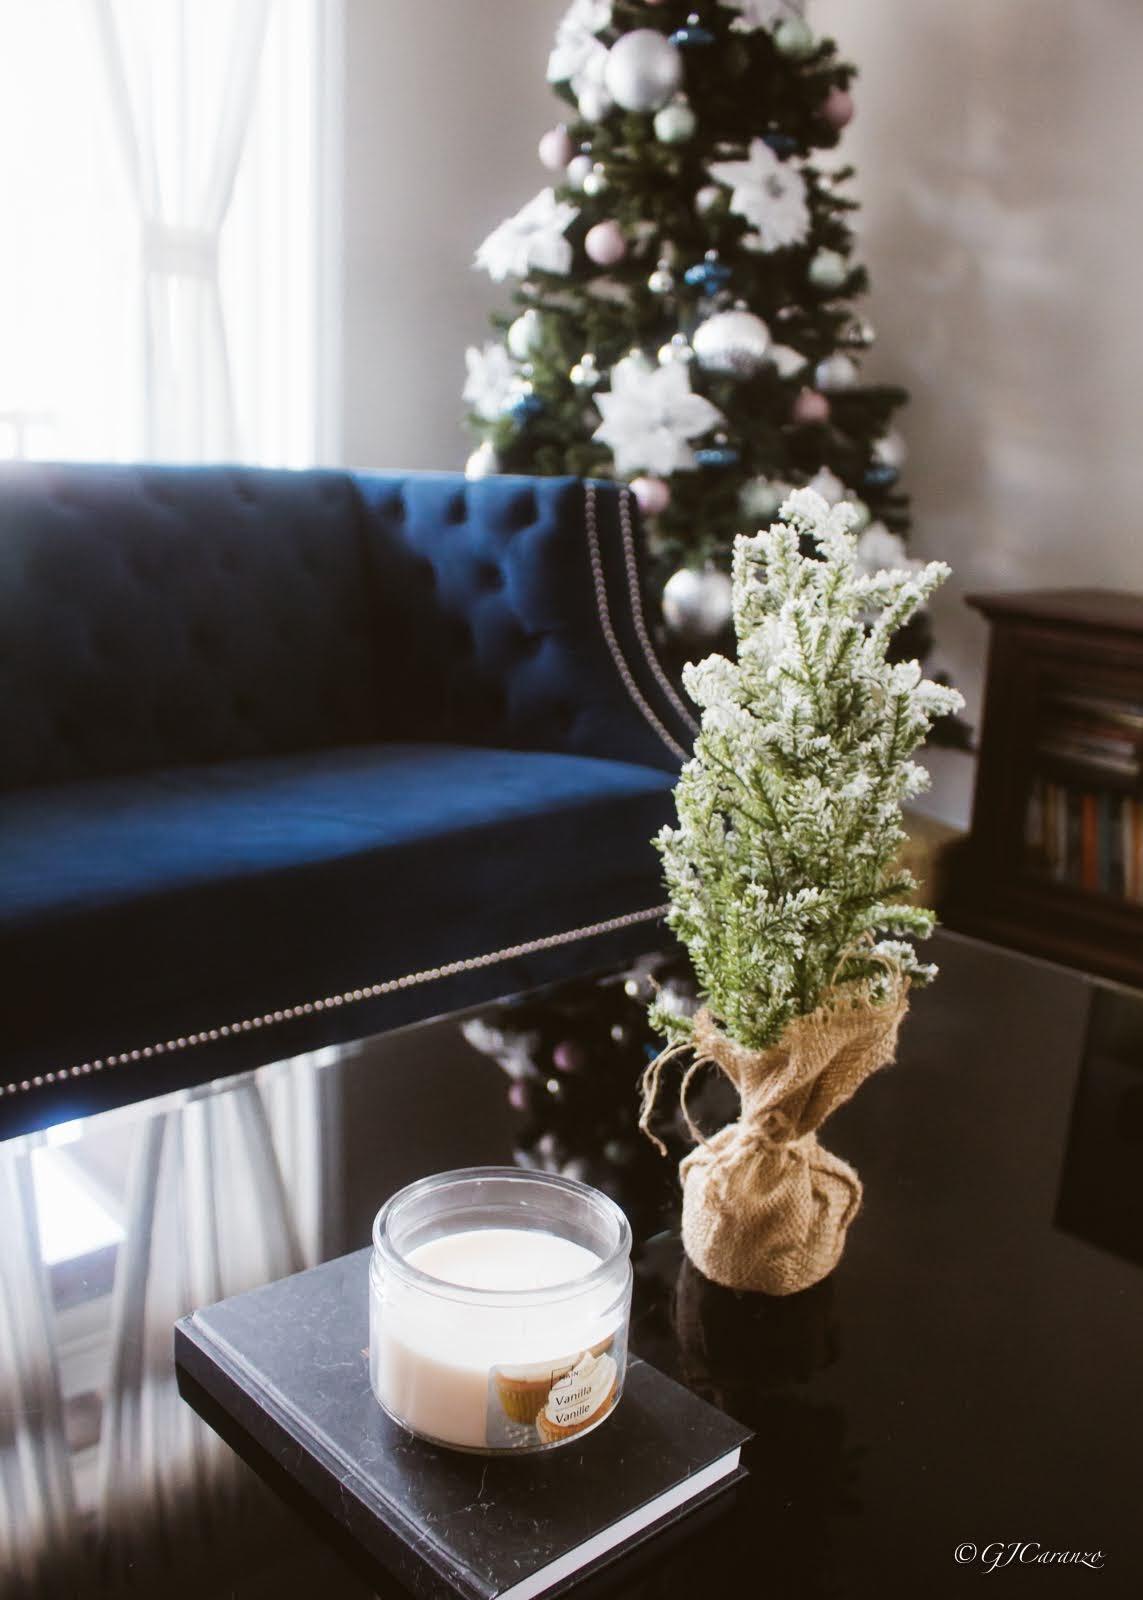 Coffee Table Christmas Decor for Less